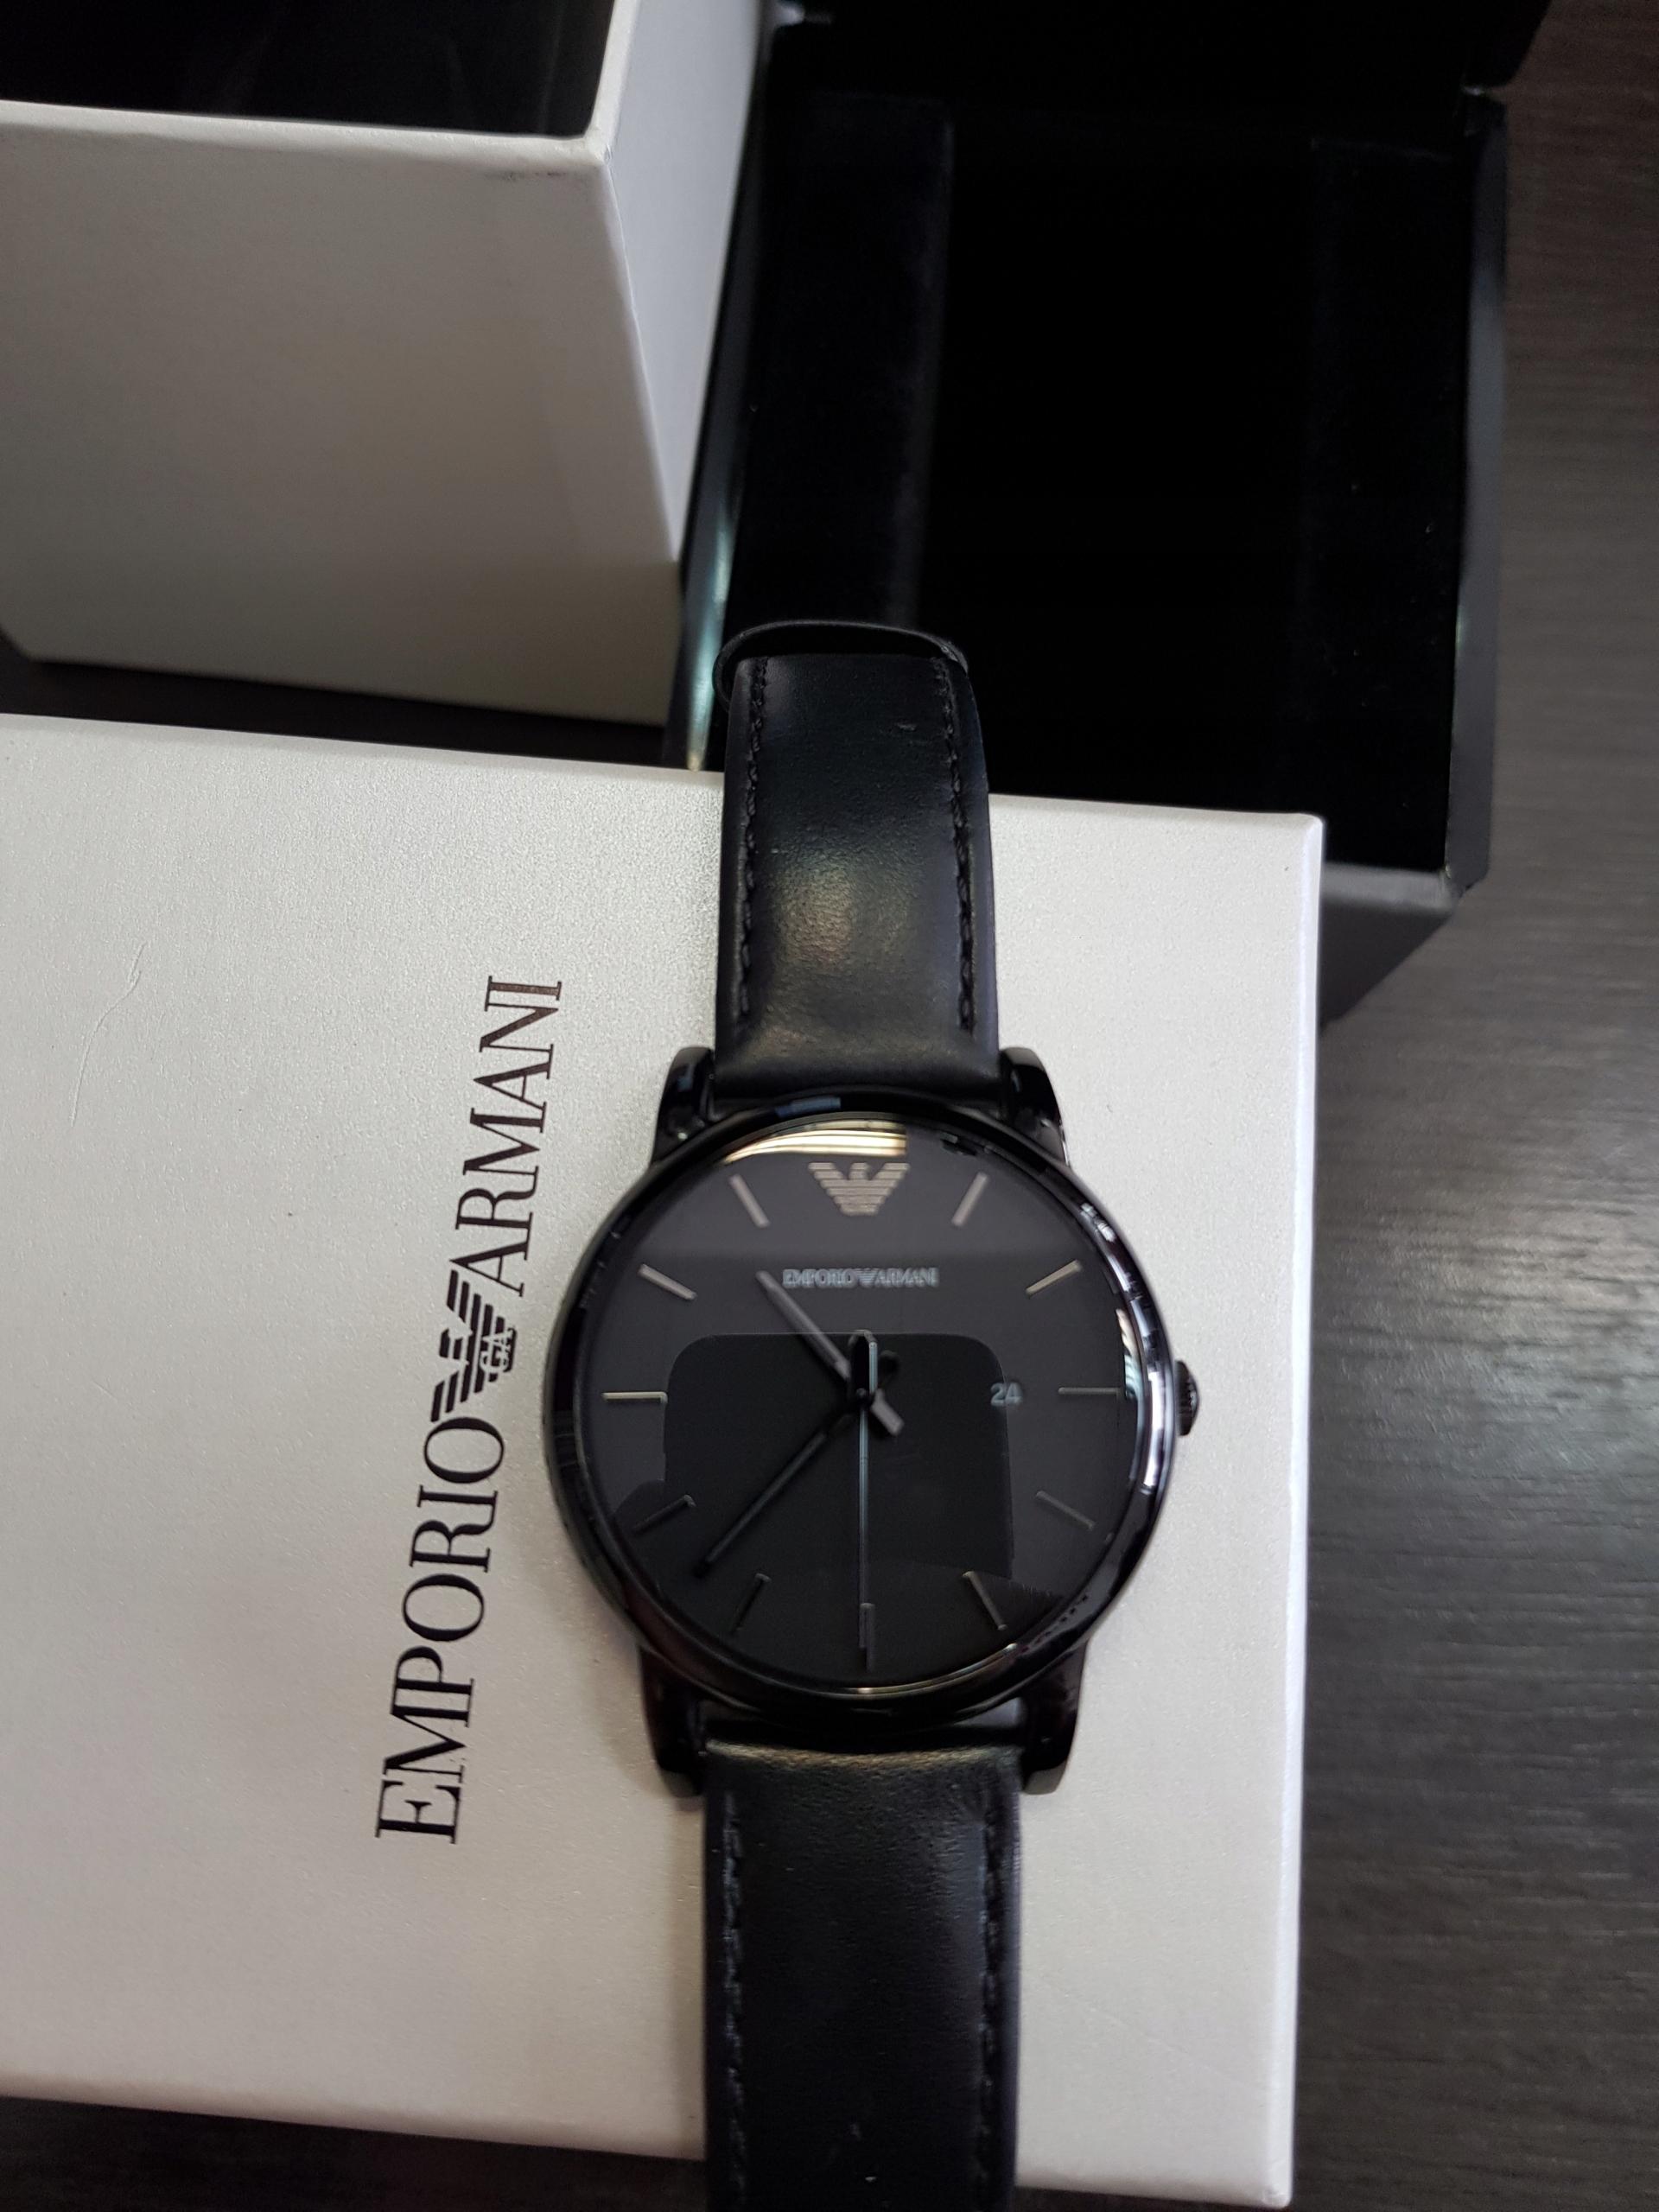 Zegarek Emporio Armani AR1732 Gwarancja!